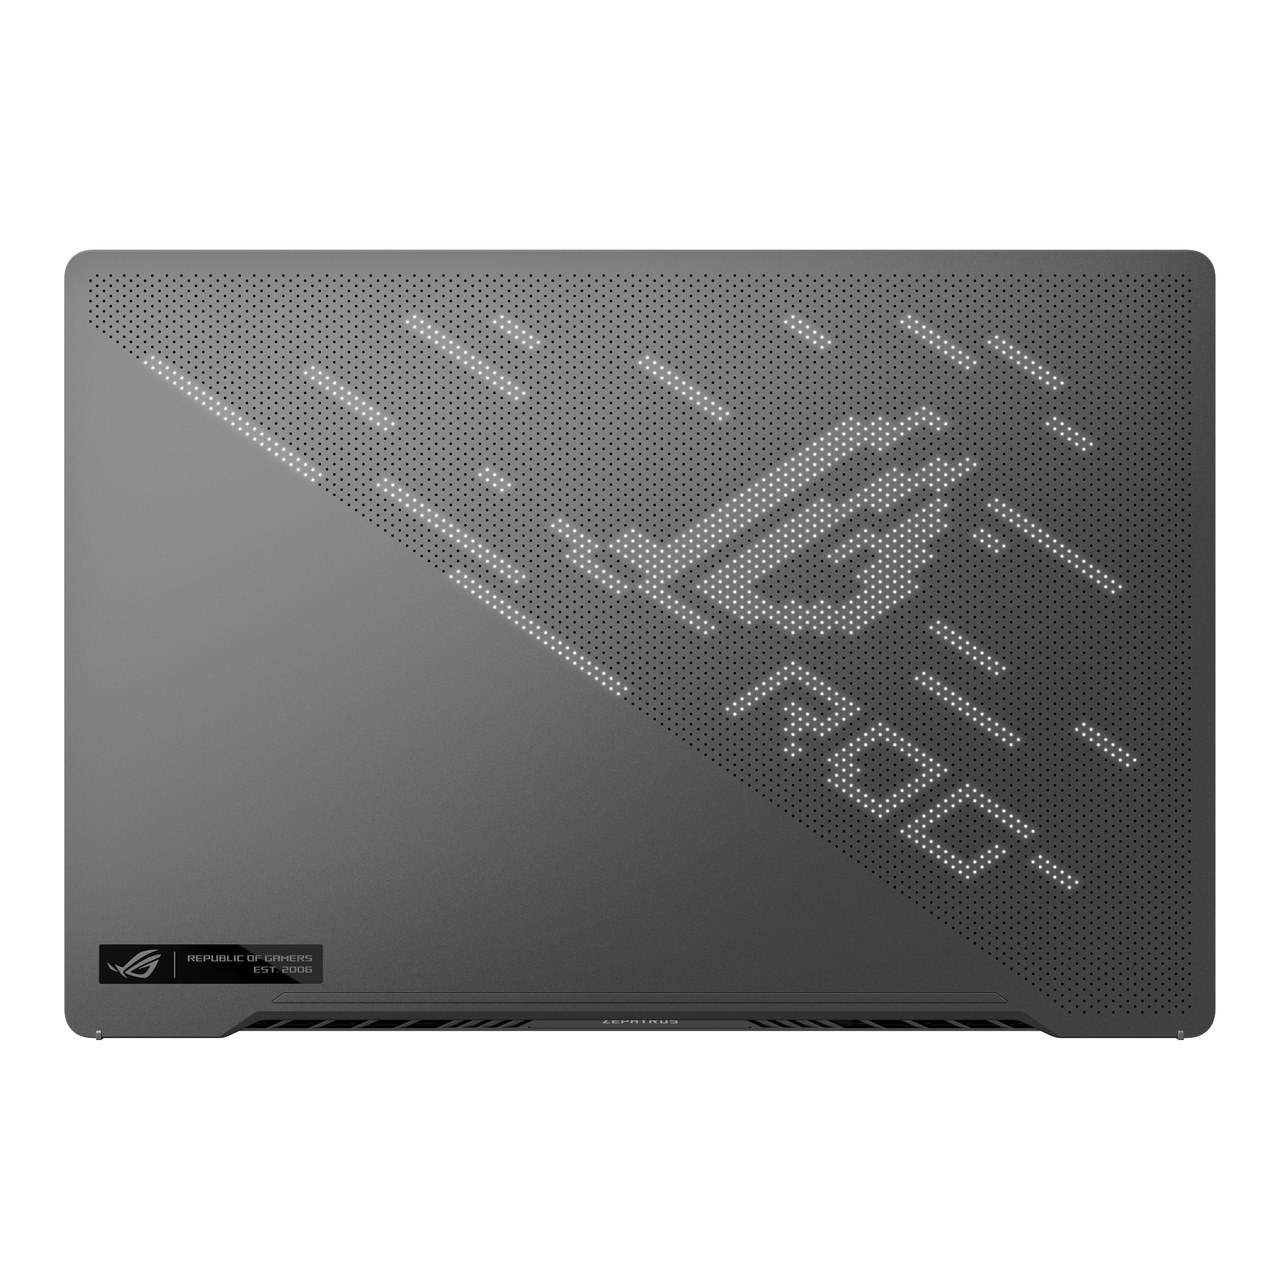 [CES 2020] Asus ra mắt ROG Zephyrus G14: Laptop gaming 14 inch mạnh nhất thế giới